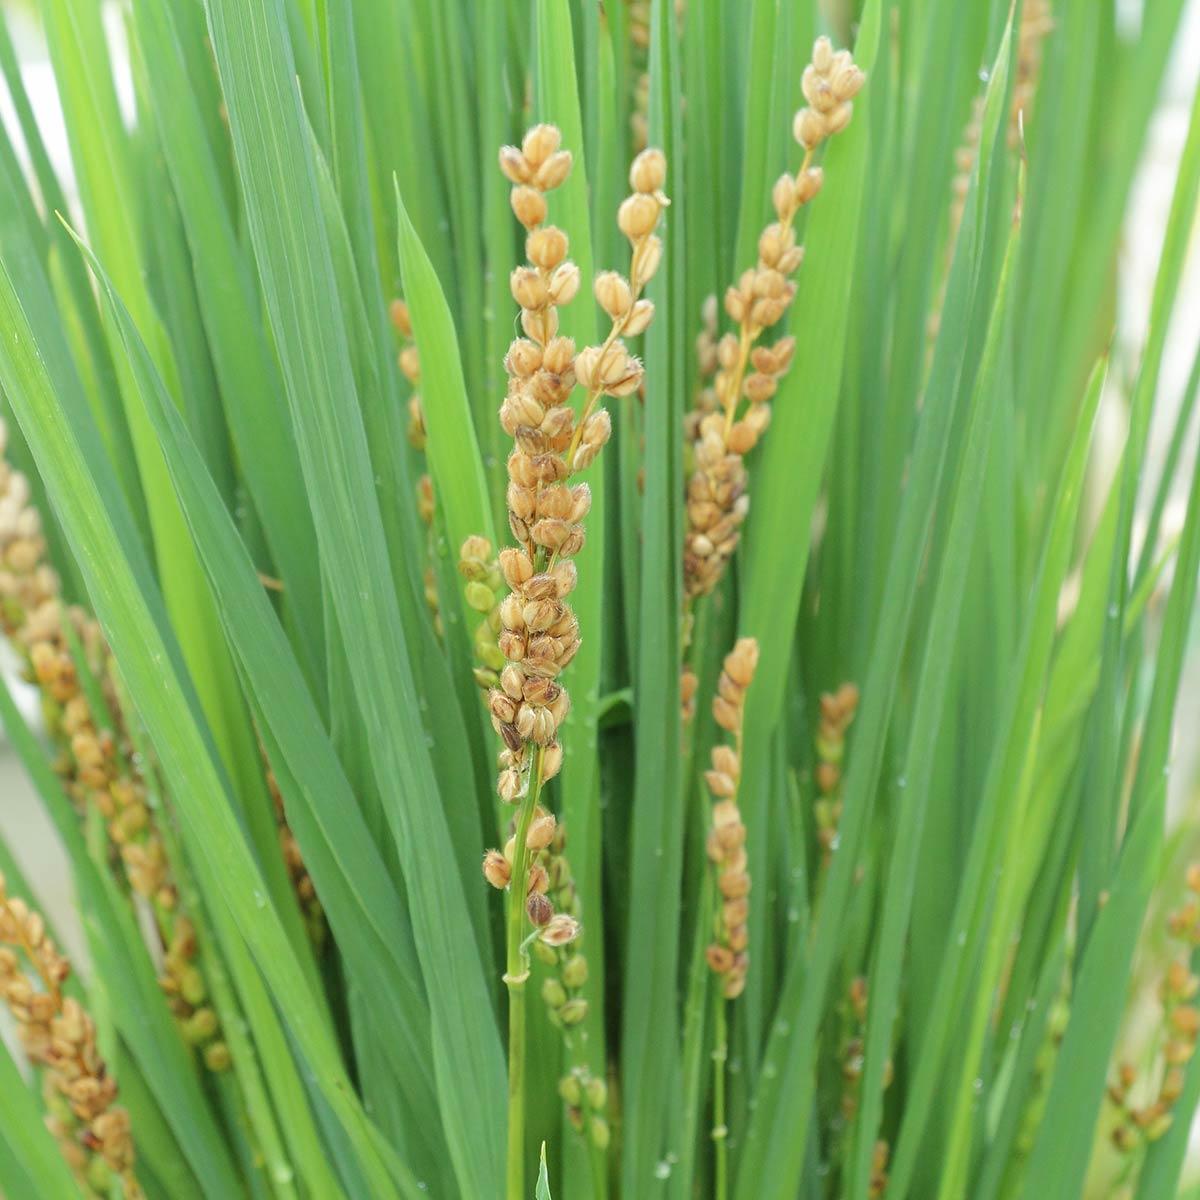 Semillas de arroz maduro